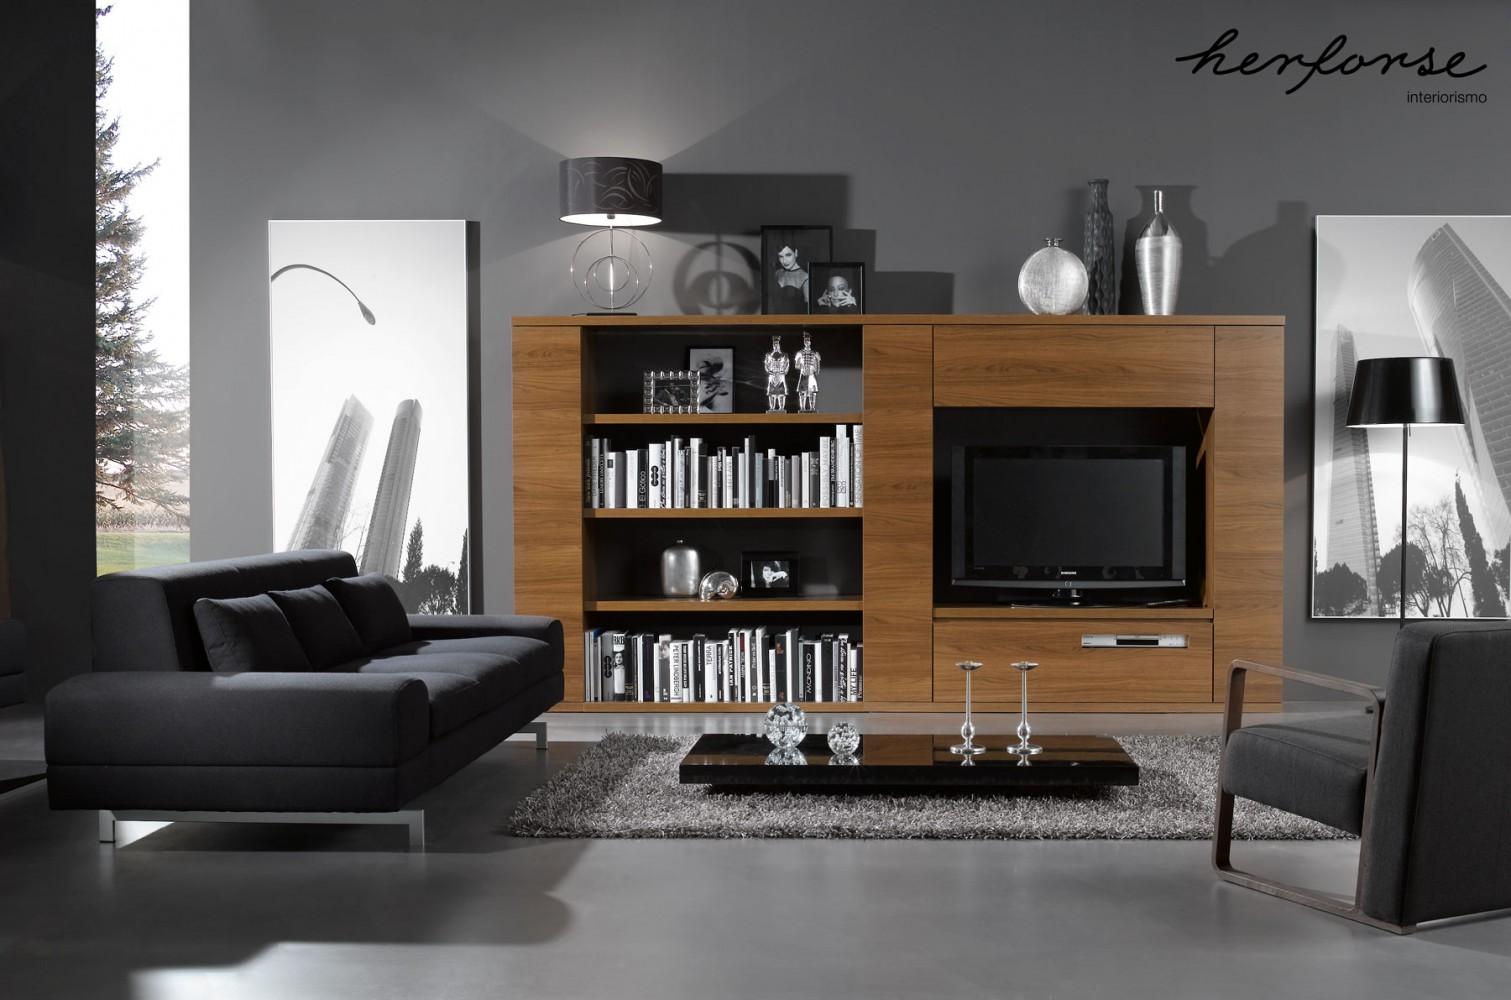 Contemporaneos modernos salones herforseinteriorismo for Sofas para salones estrechos